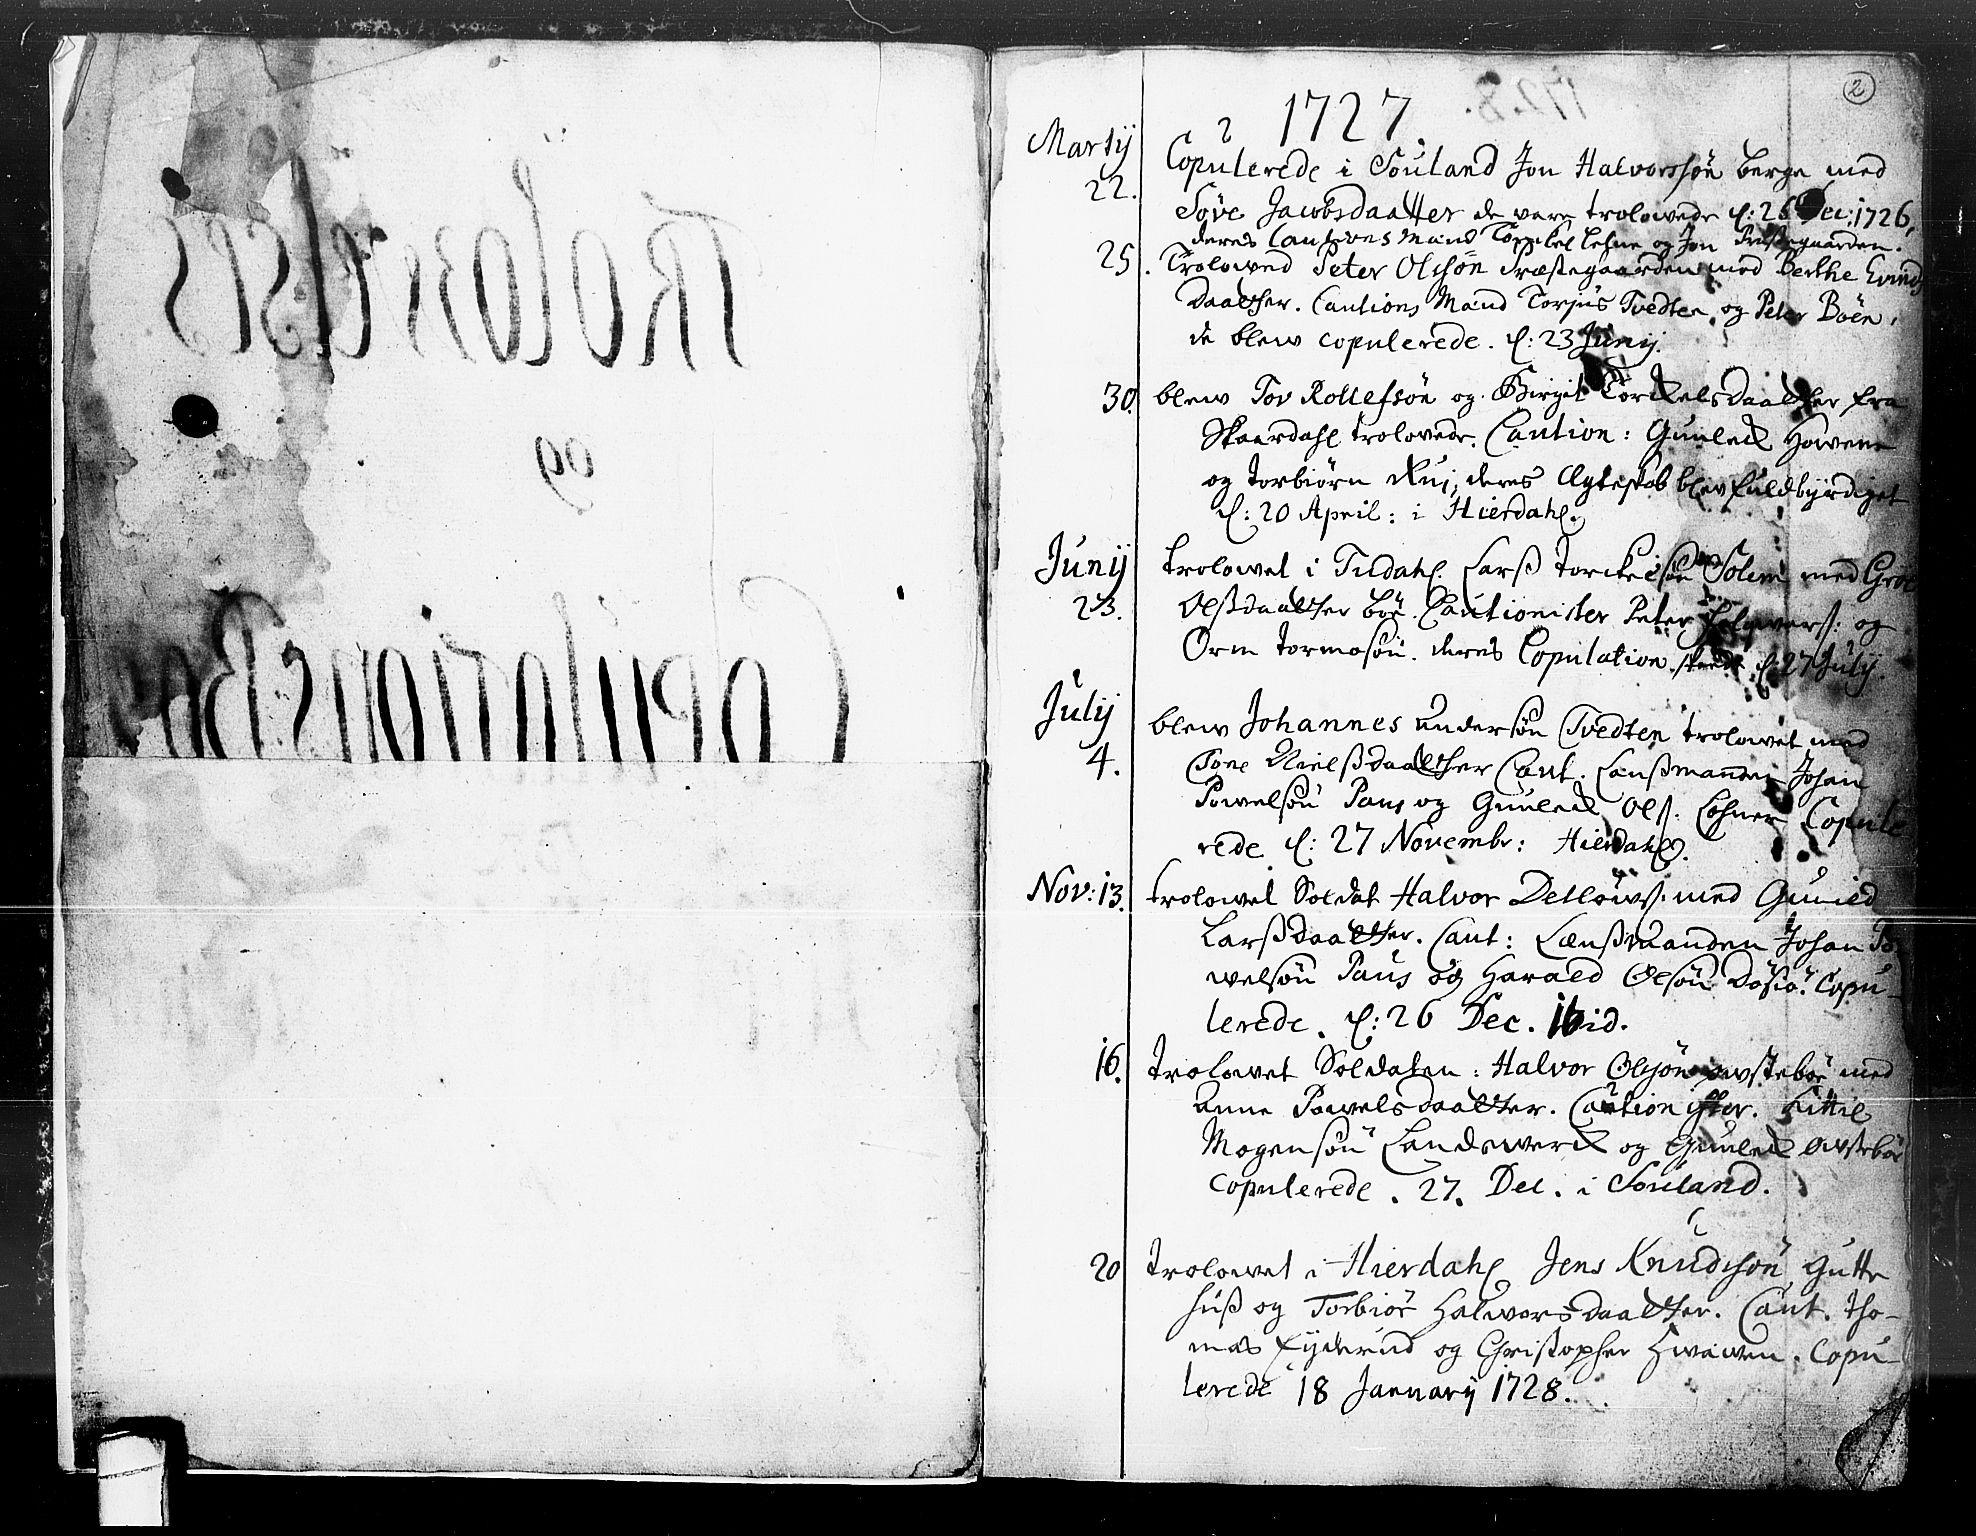 SAKO, Hjartdal kirkebøker, F/Fa/L0004: Ministerialbok nr. I 4, 1727-1795, s. 2